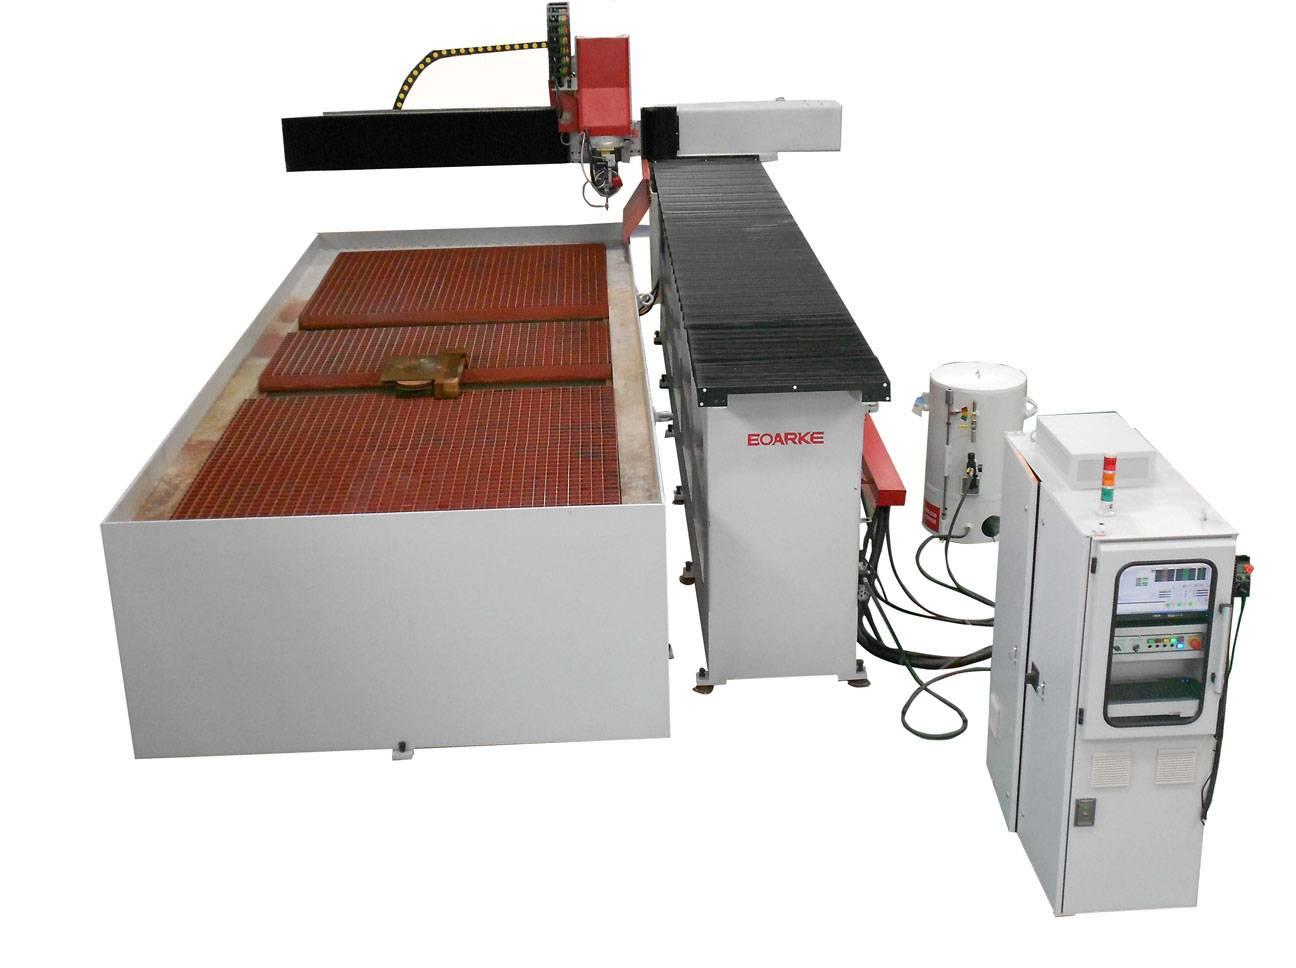 5 Axes CNC waterjet cutting machine